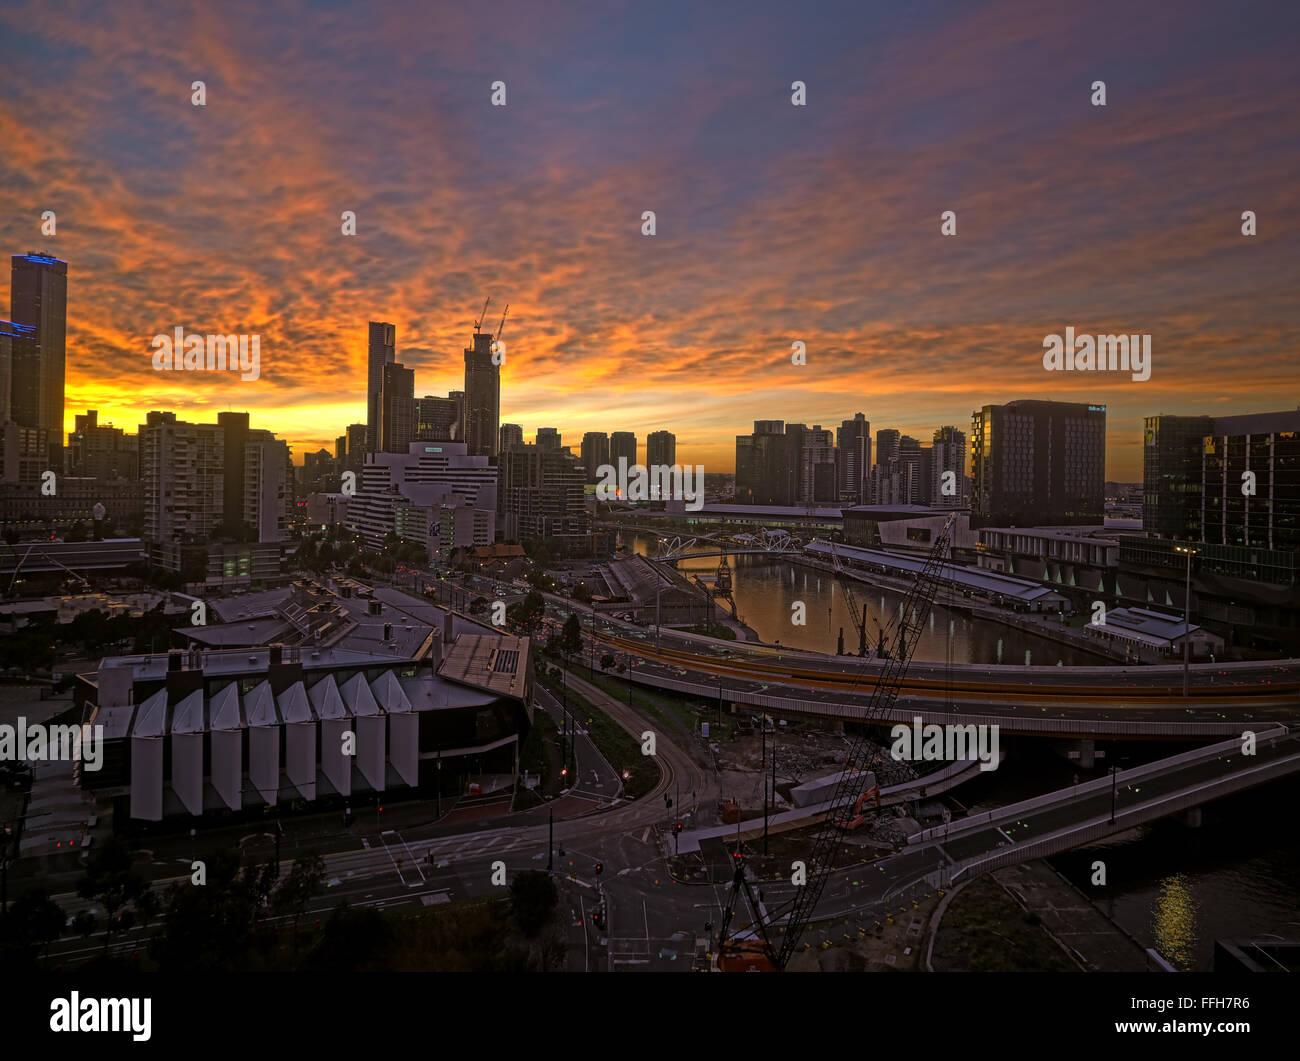 Sunrise Docklands Melbourne Cityscape HDR 9 layer photo - Stock Image